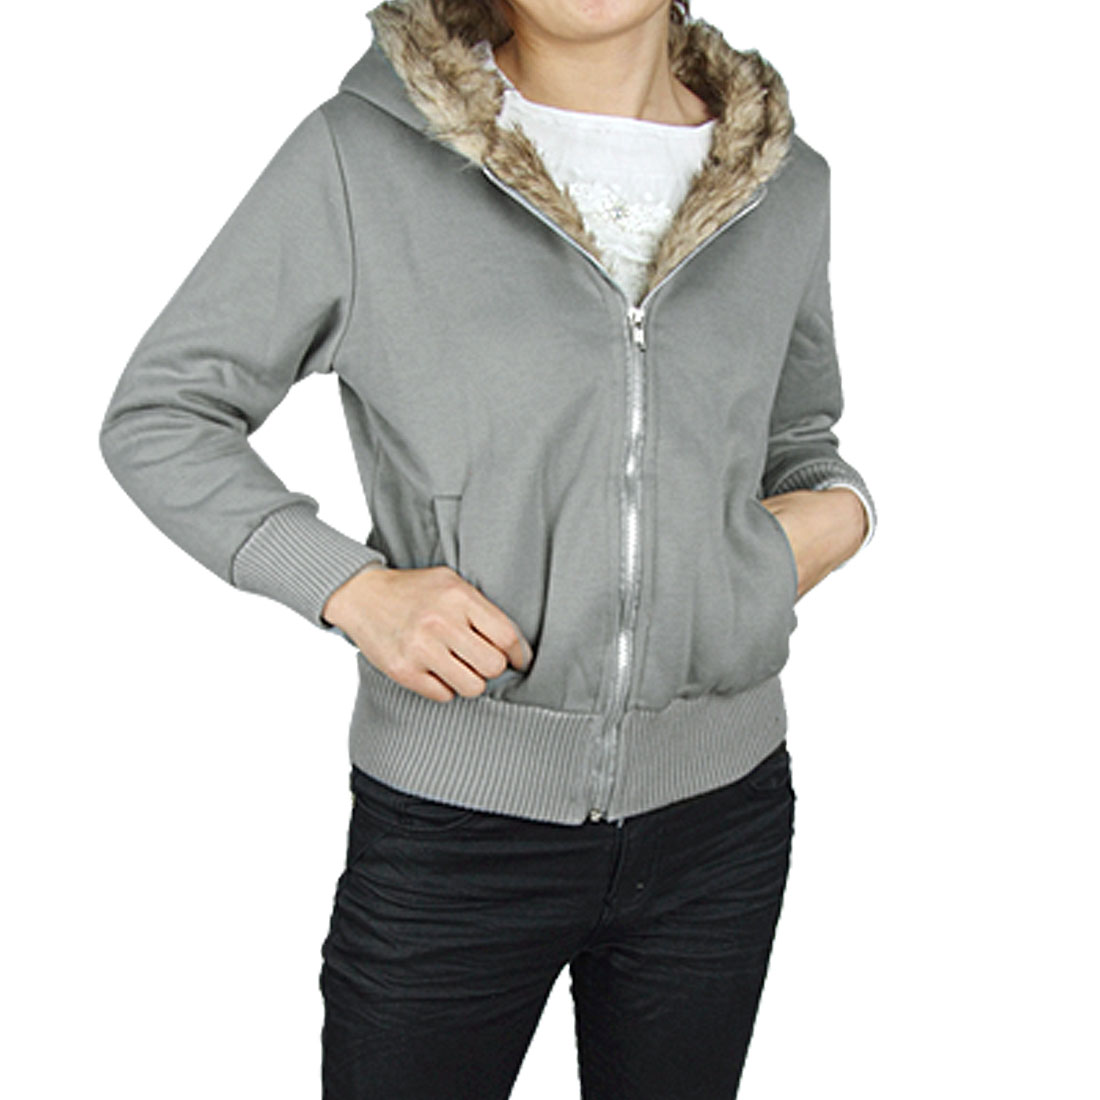 Lady Gray Ribbing Elastic Cuff Slanted Pocket Zipper Hoodie Warm Coat